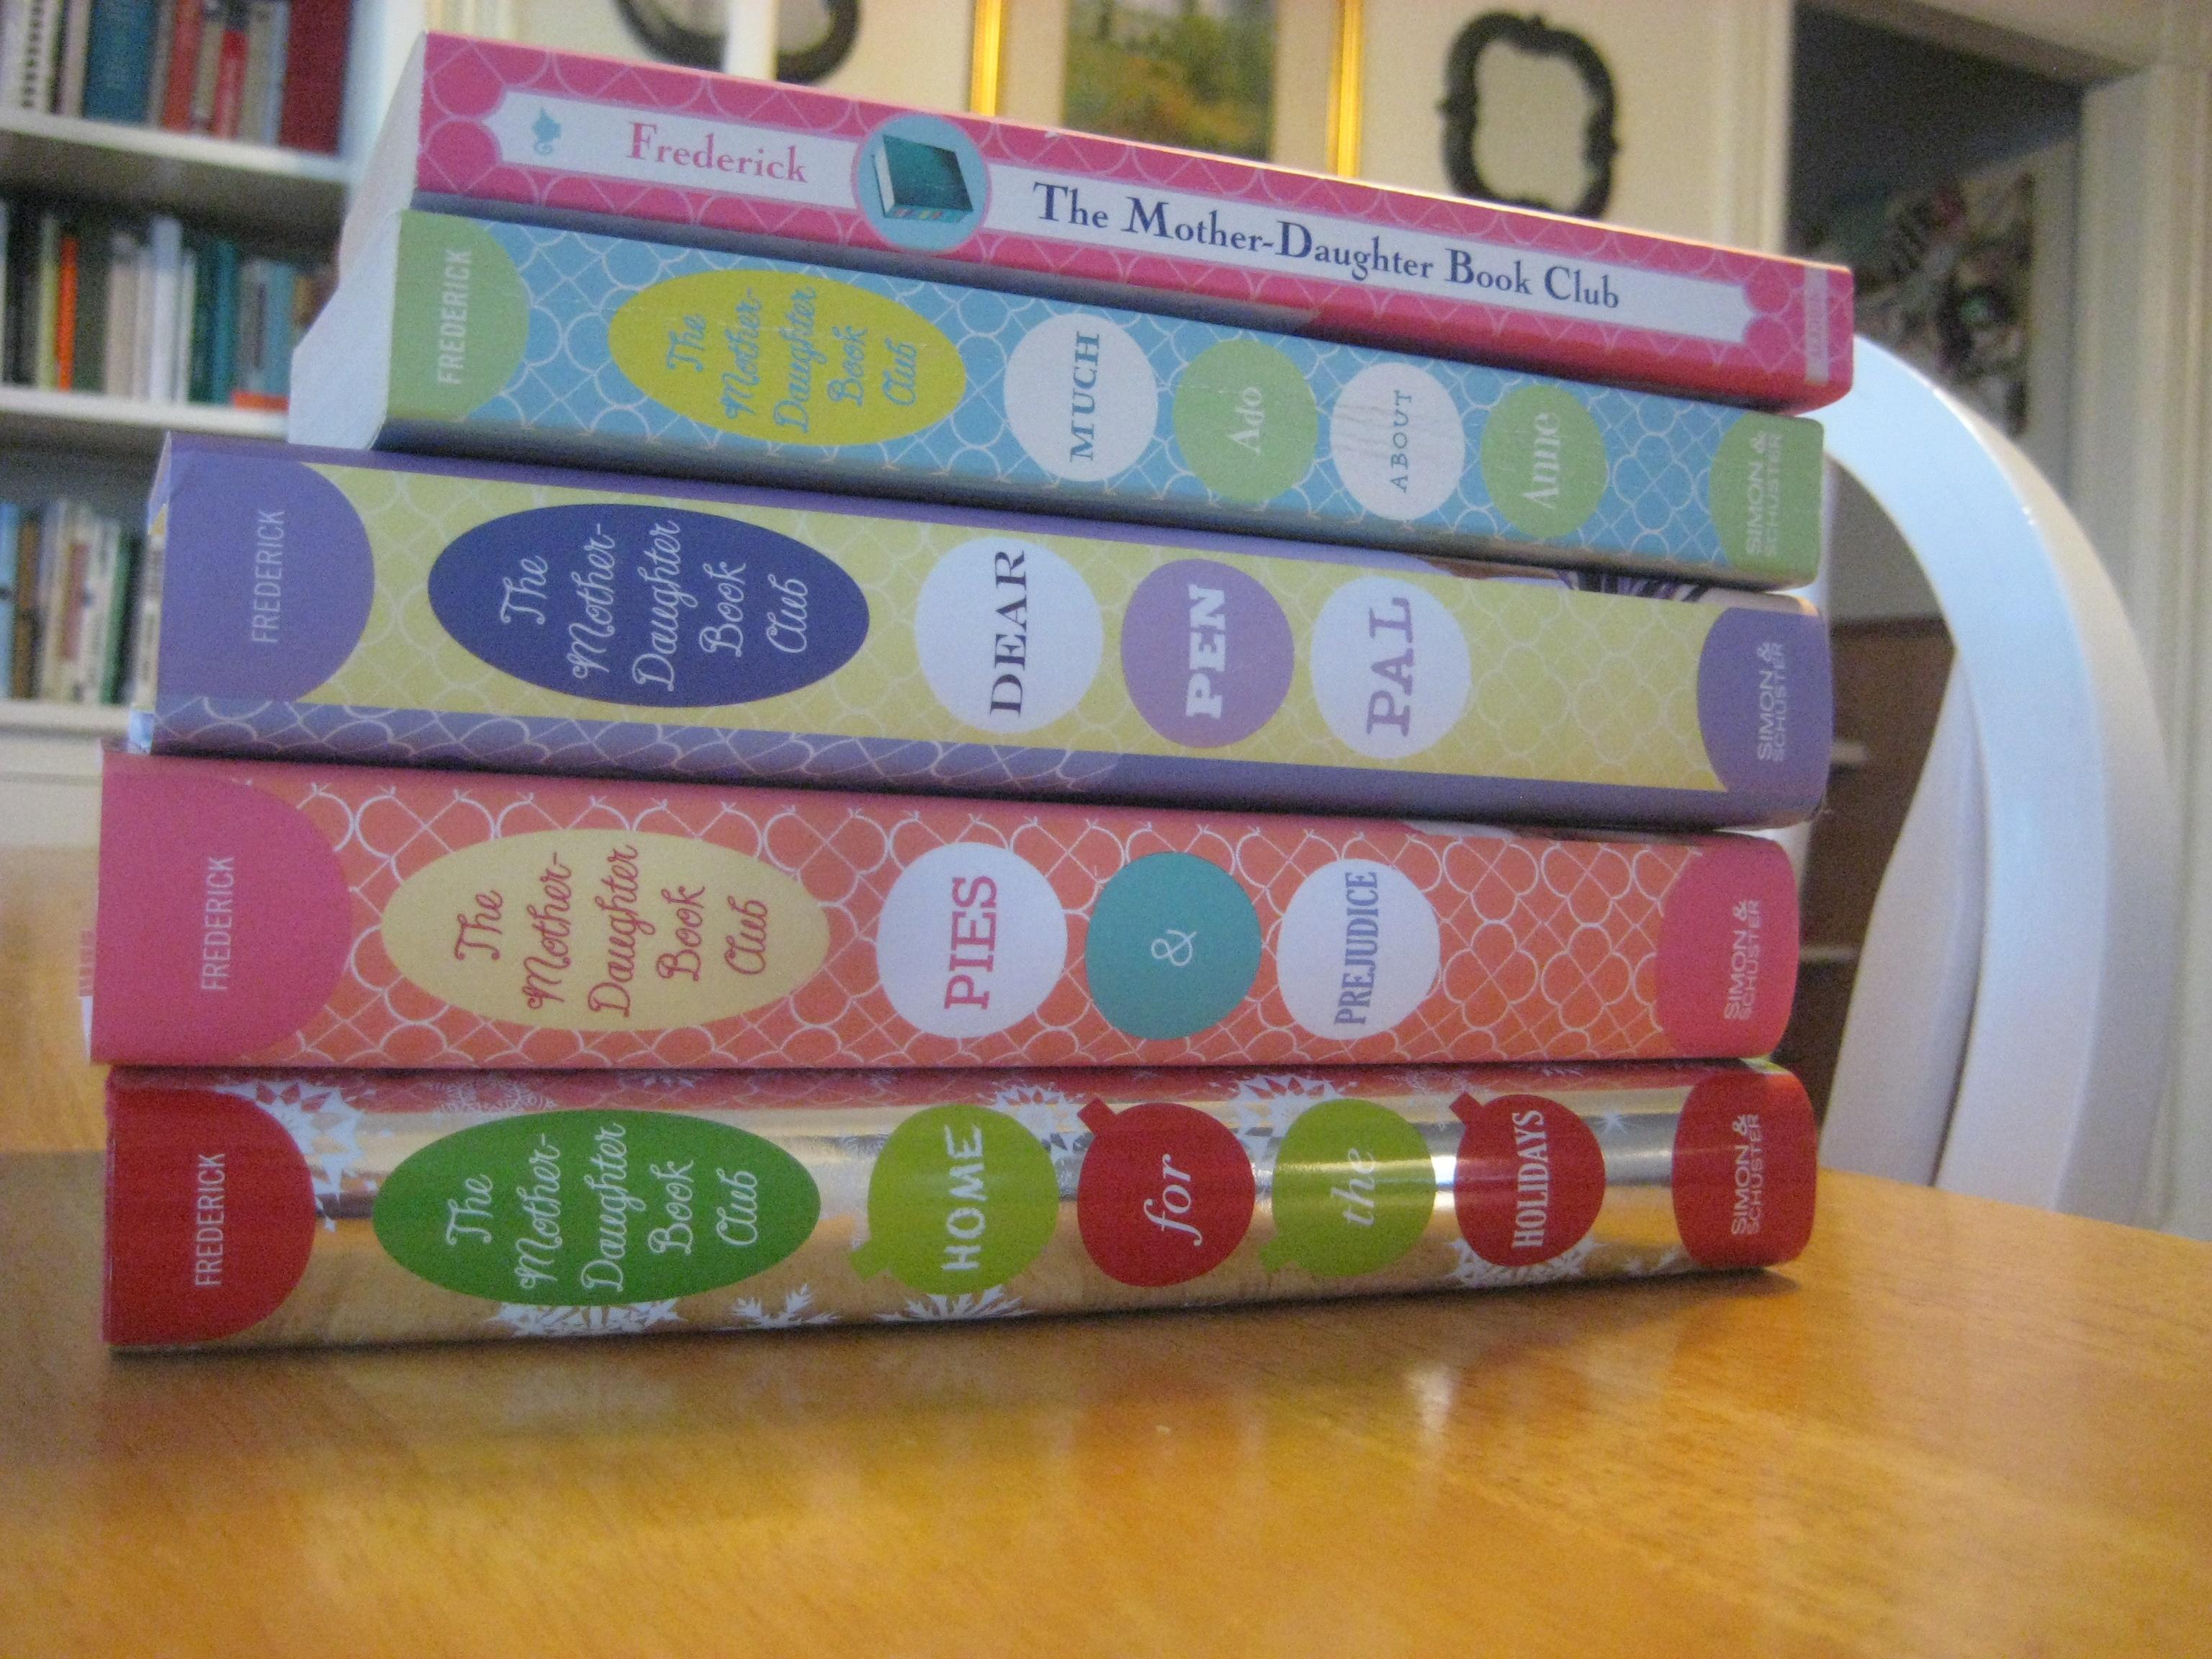 mother daughter book club series heather vogel frederick